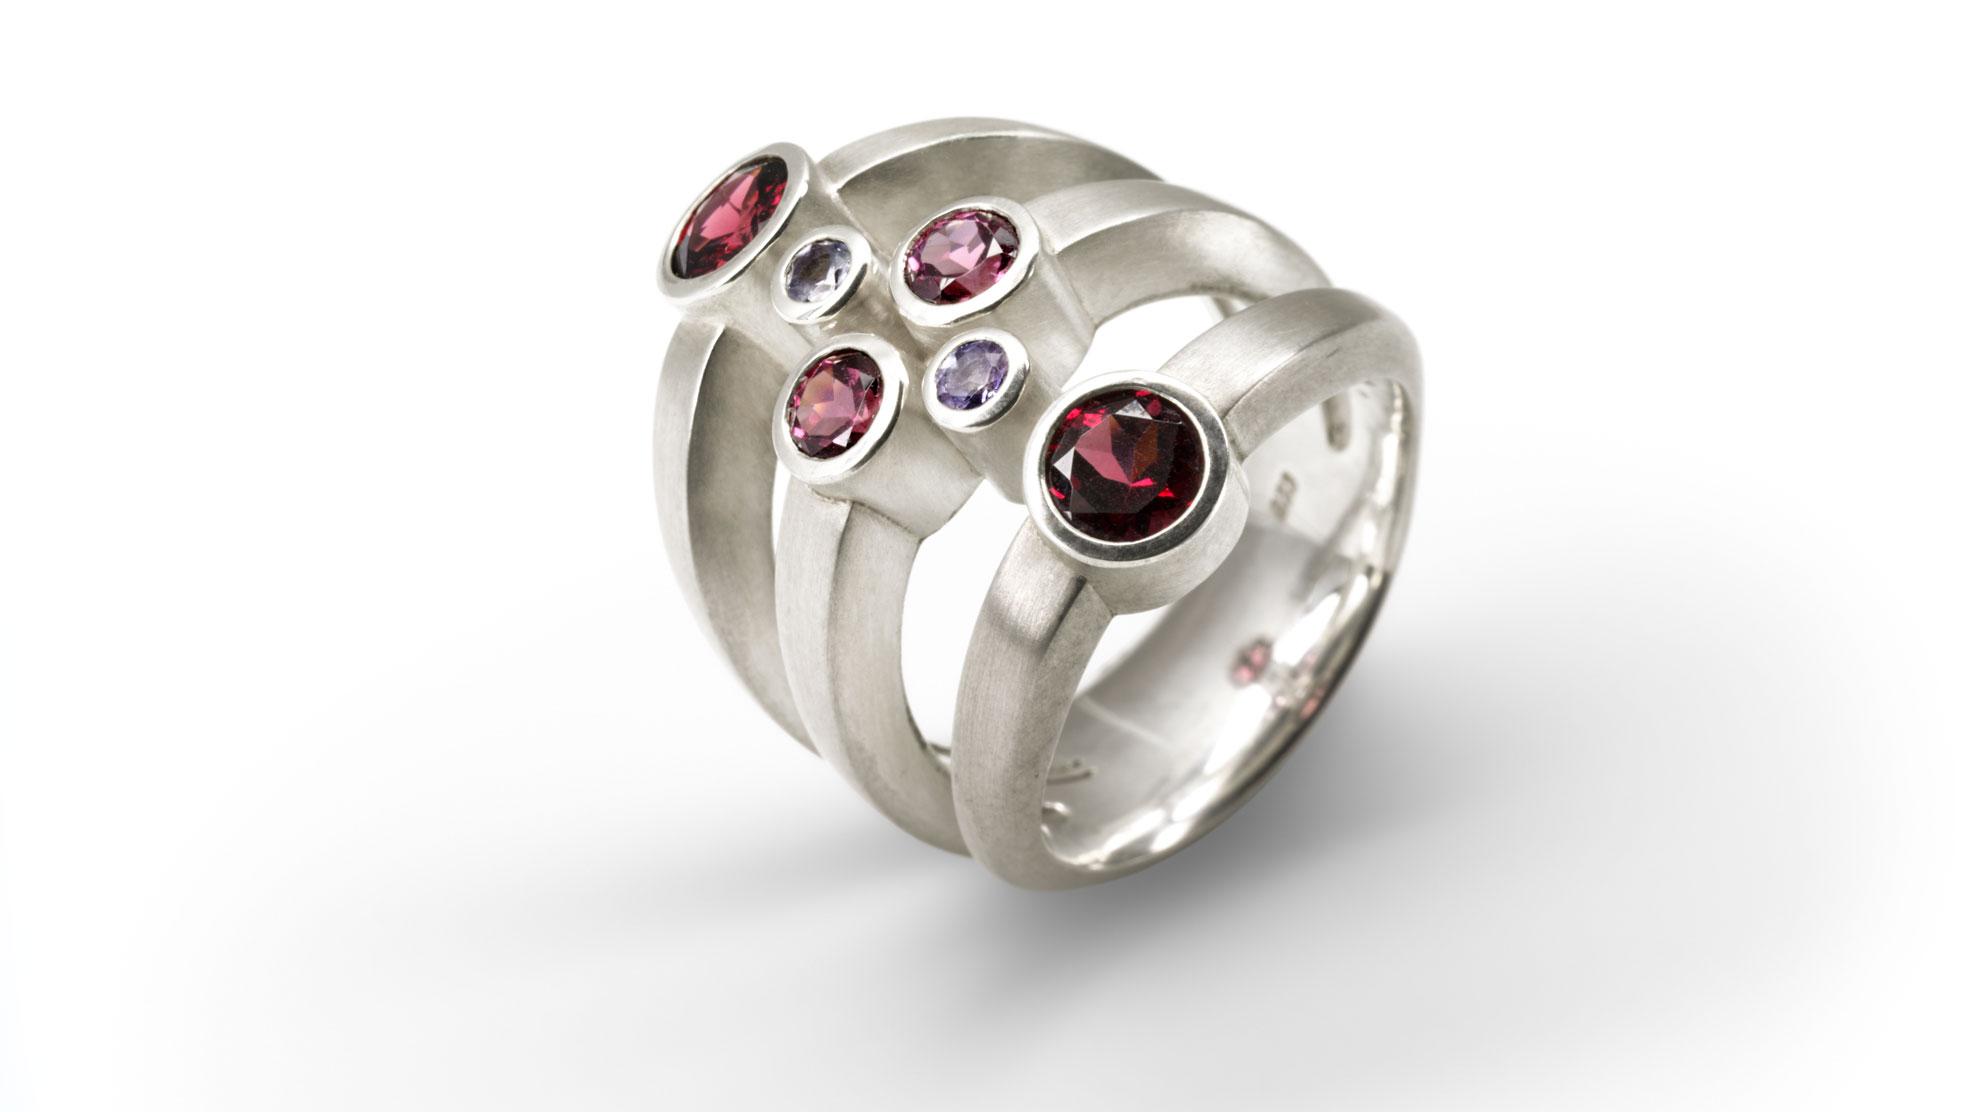 01 Ring Trio 925er Silber mit Granat, Tansanit und Turmalin